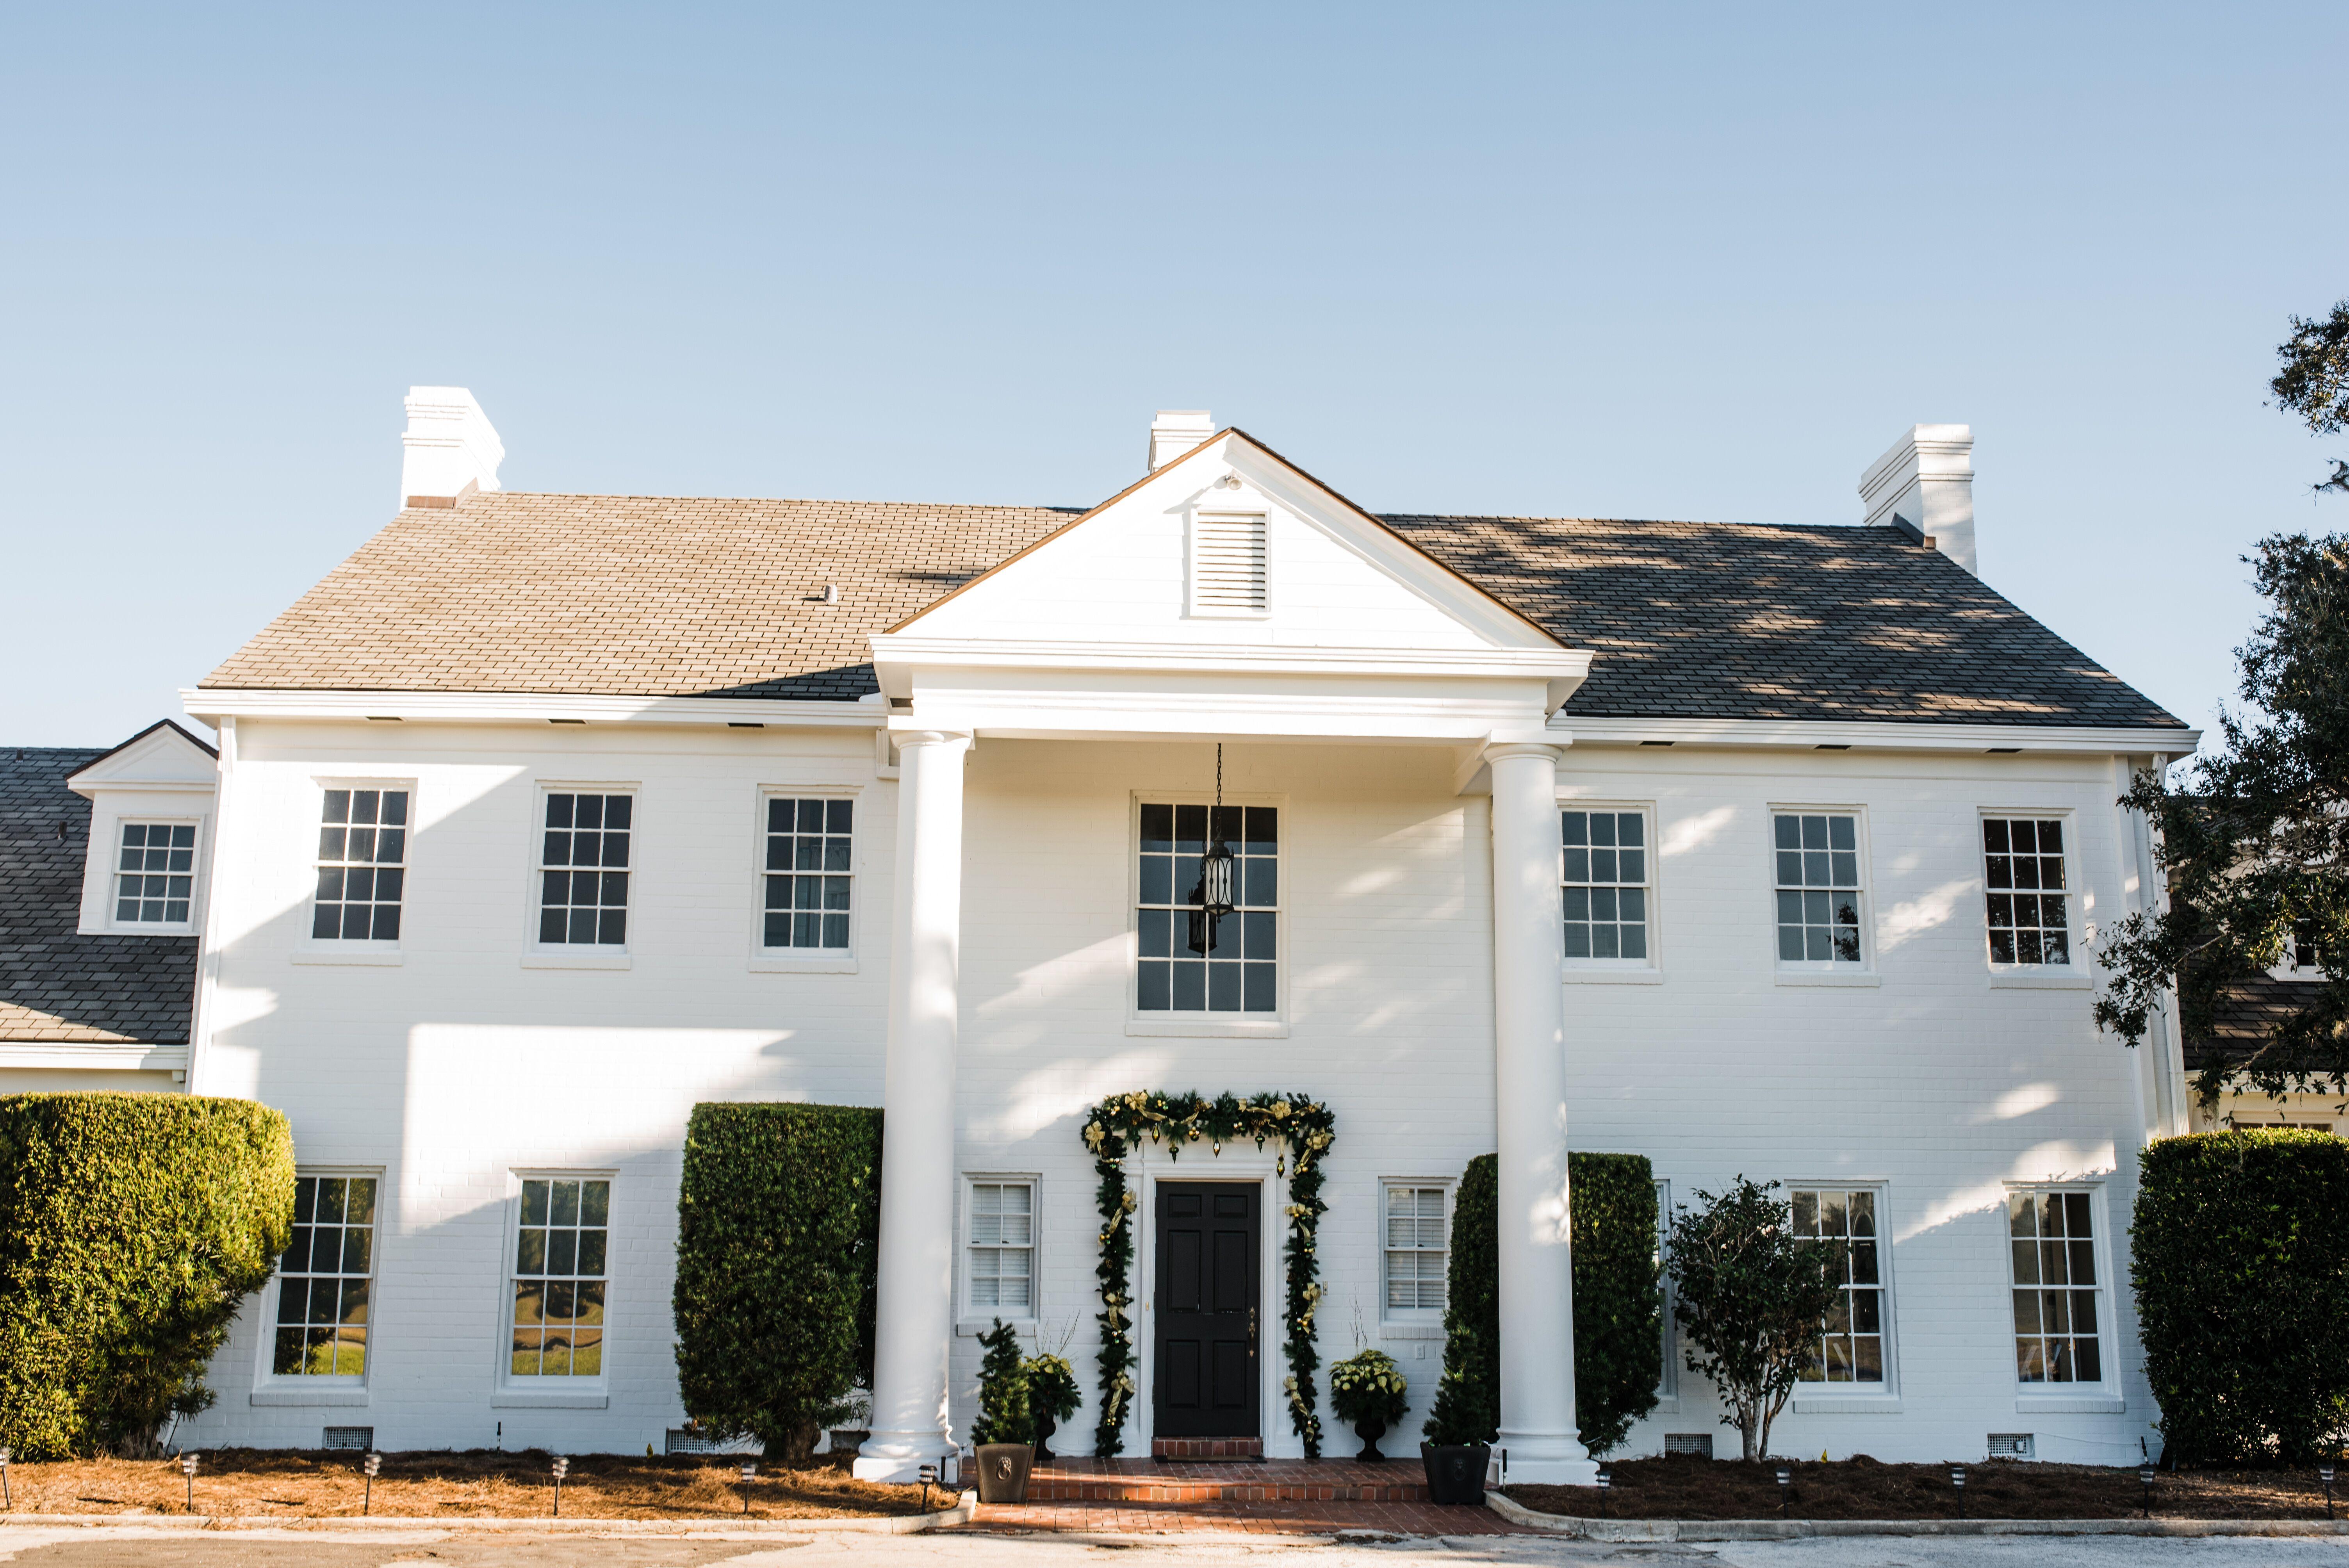 adams estate reception venues lake alfred fl. Black Bedroom Furniture Sets. Home Design Ideas